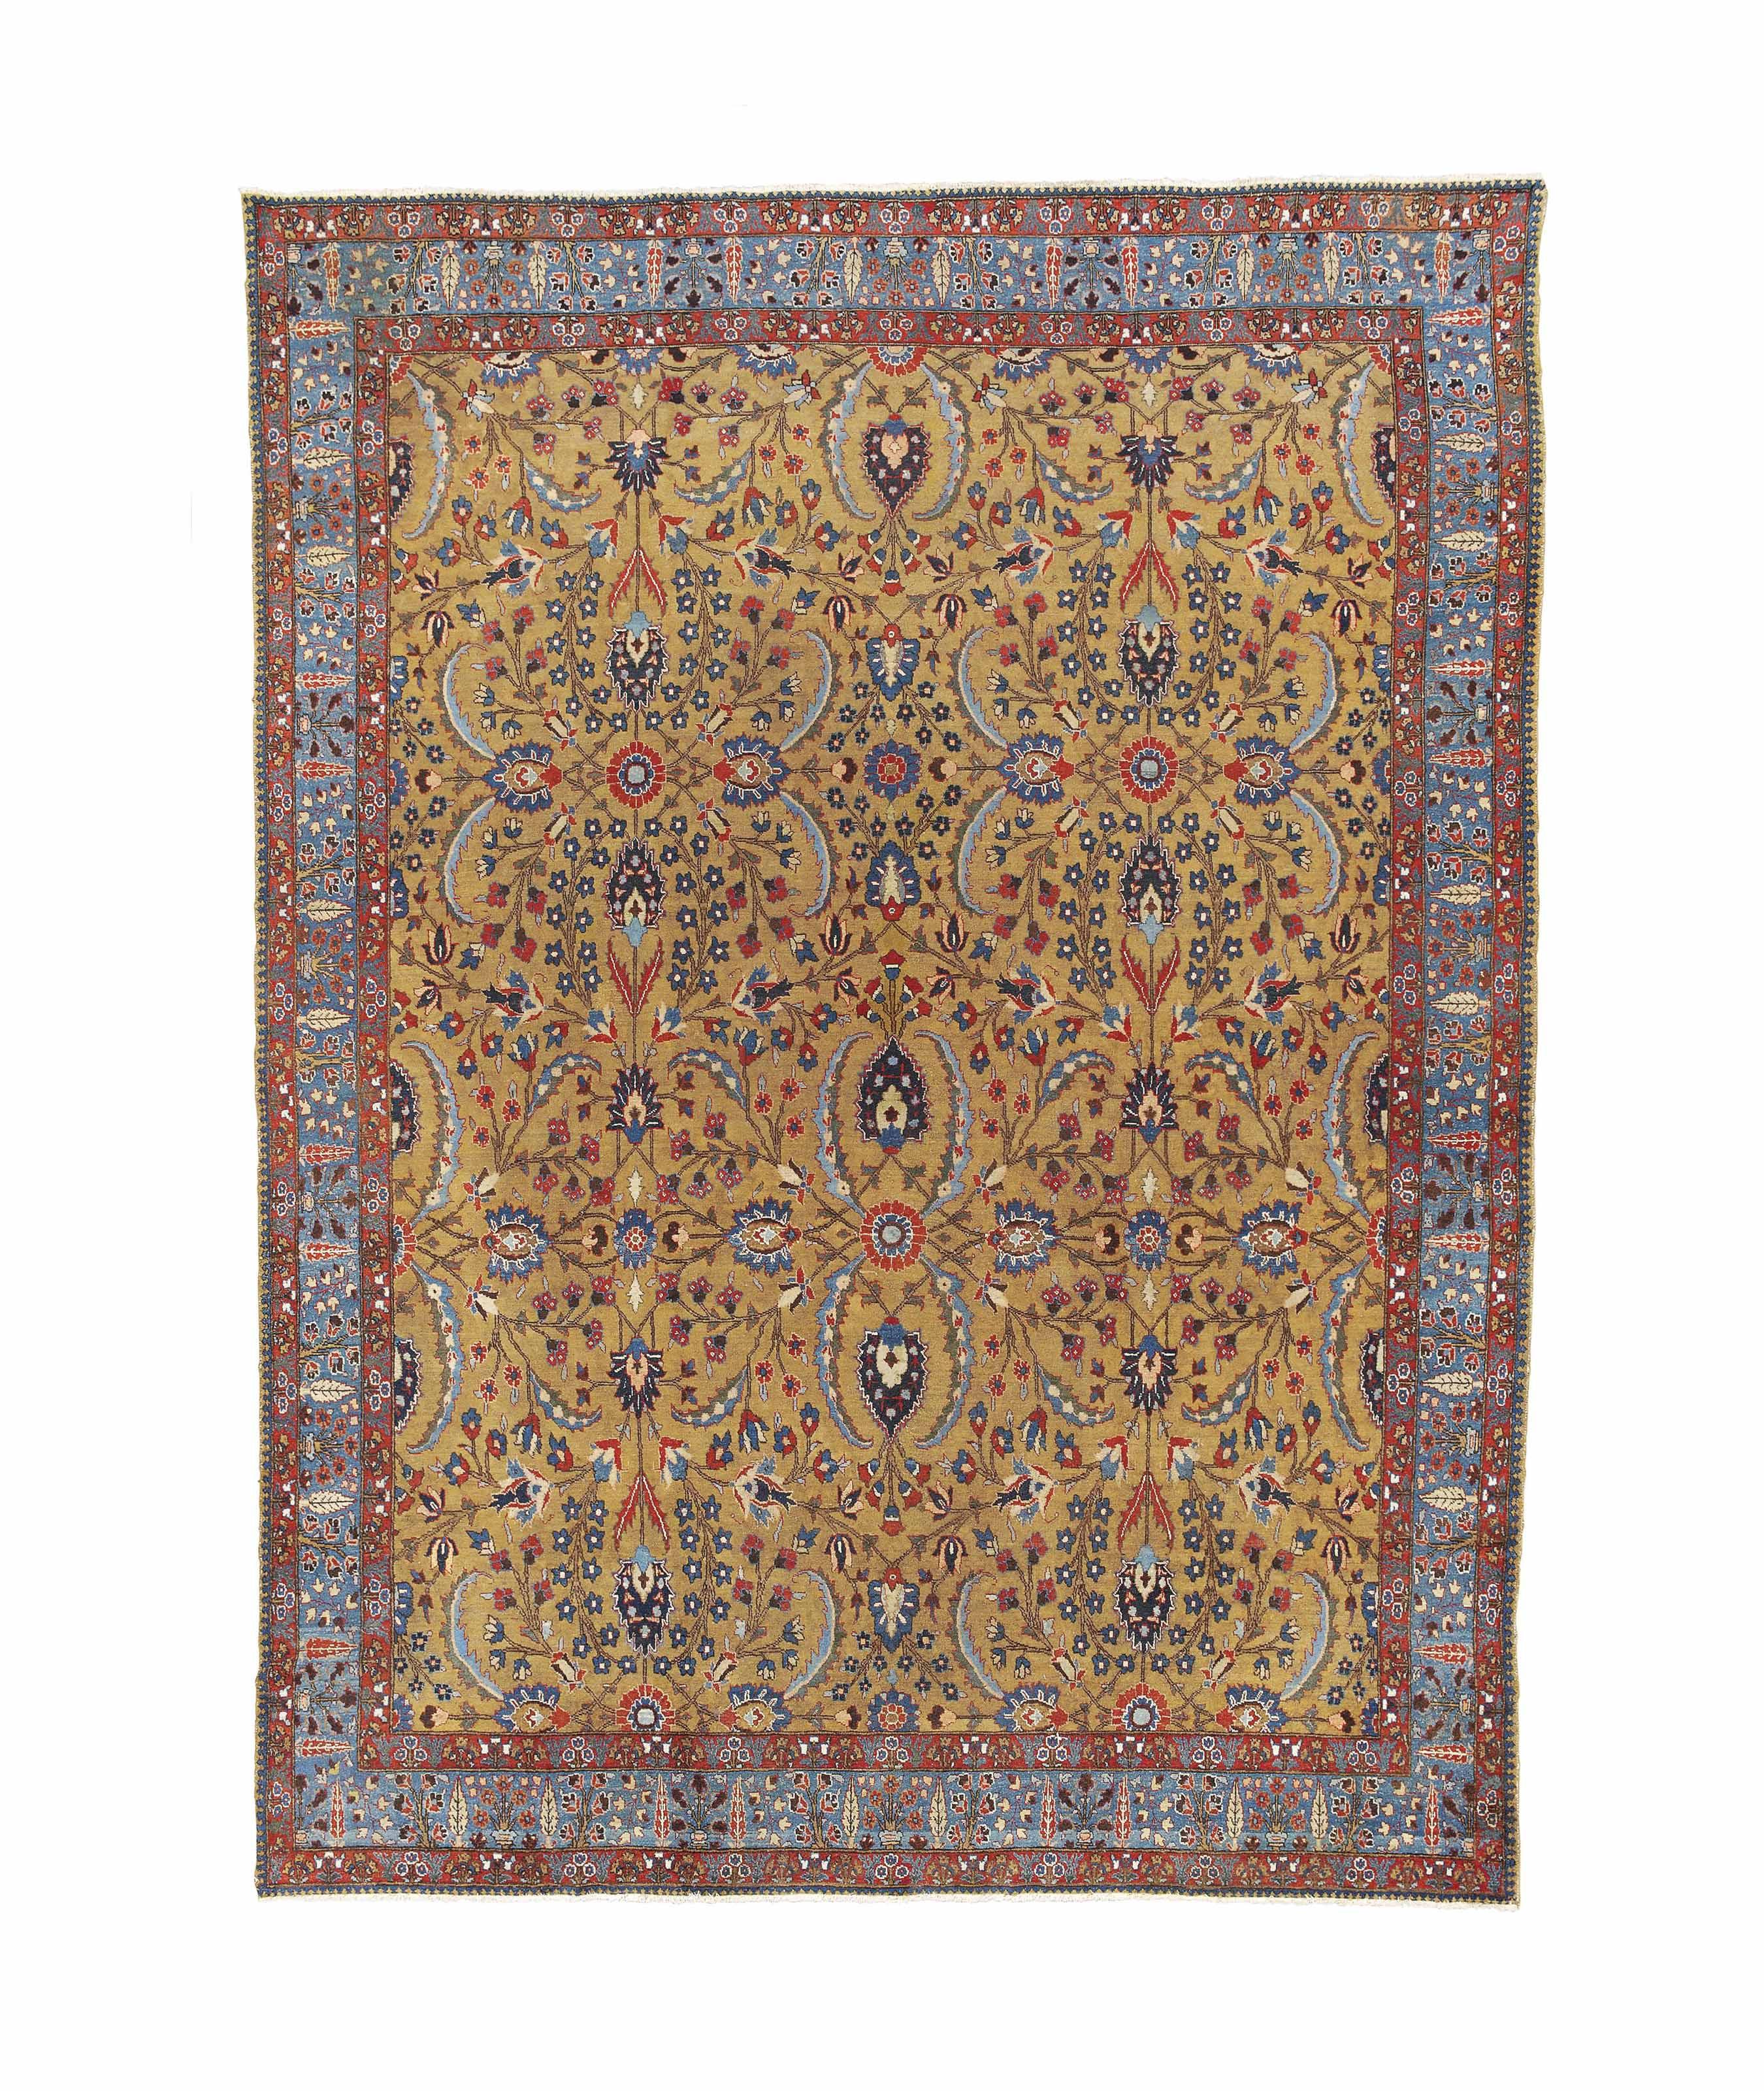 An antique Khoy Tabriz carpet